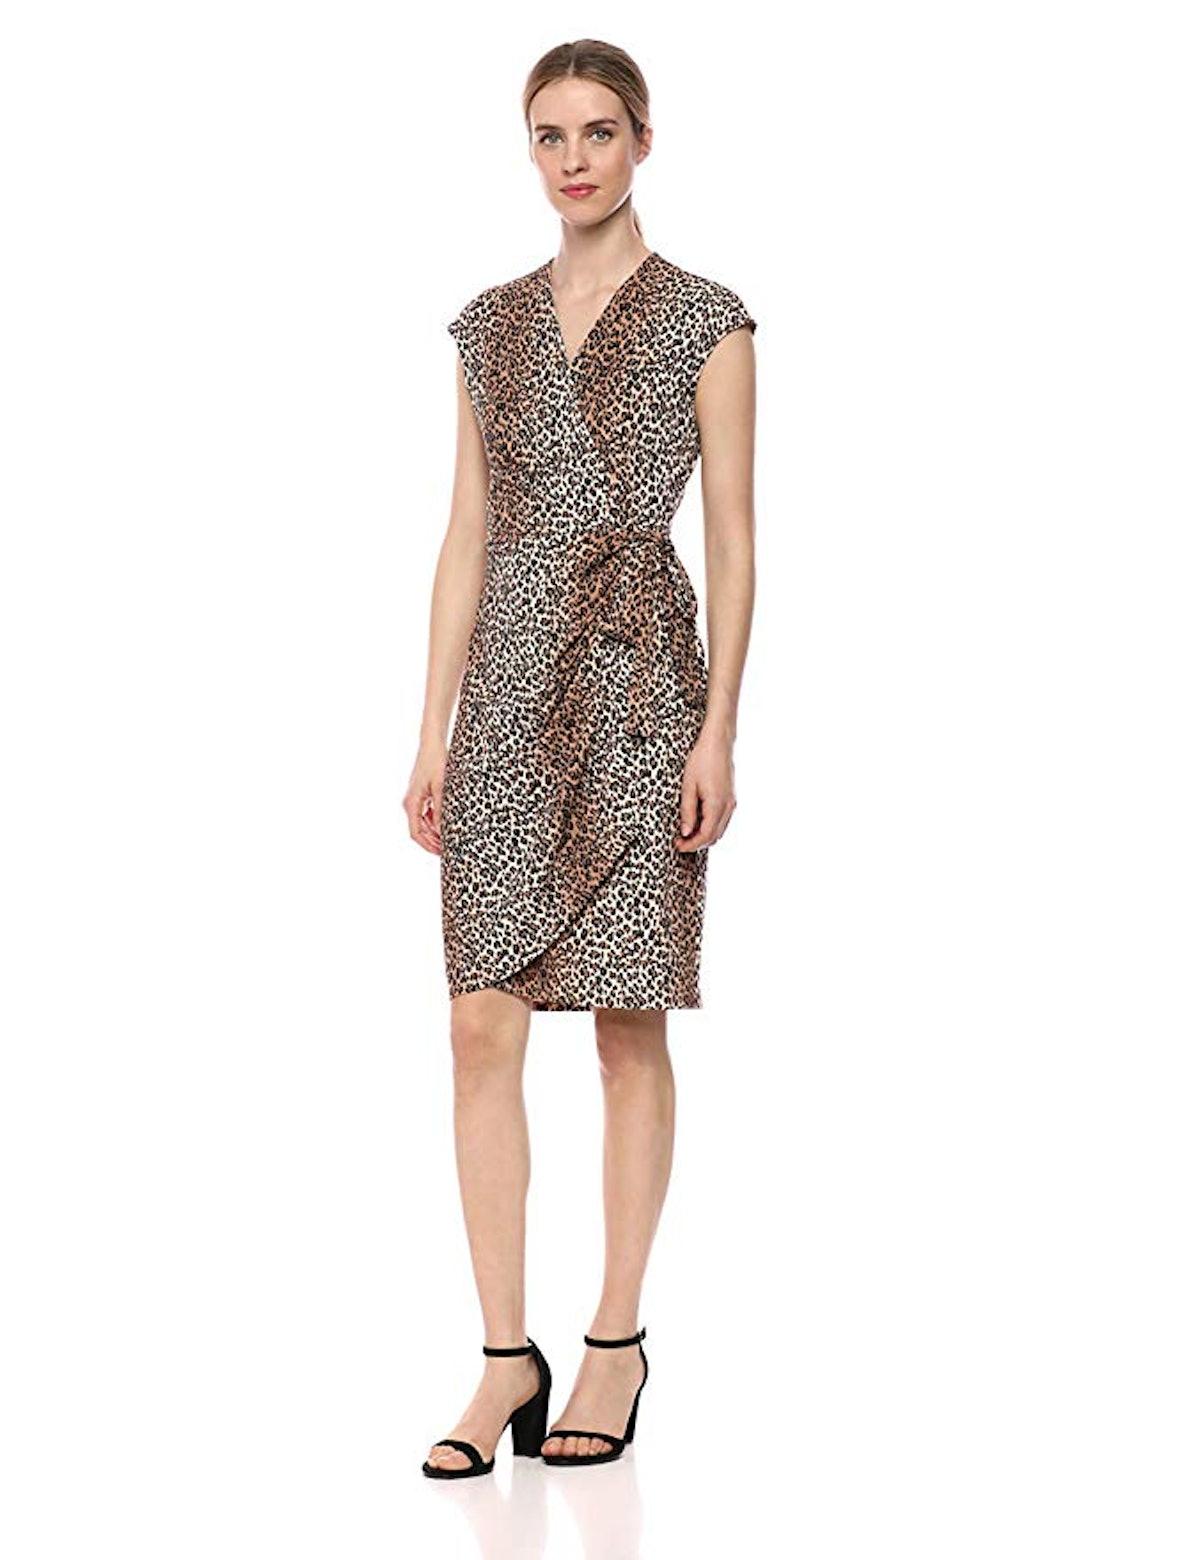 Lark & Ro Women's Classic Cap Sleeve Wrap Dress